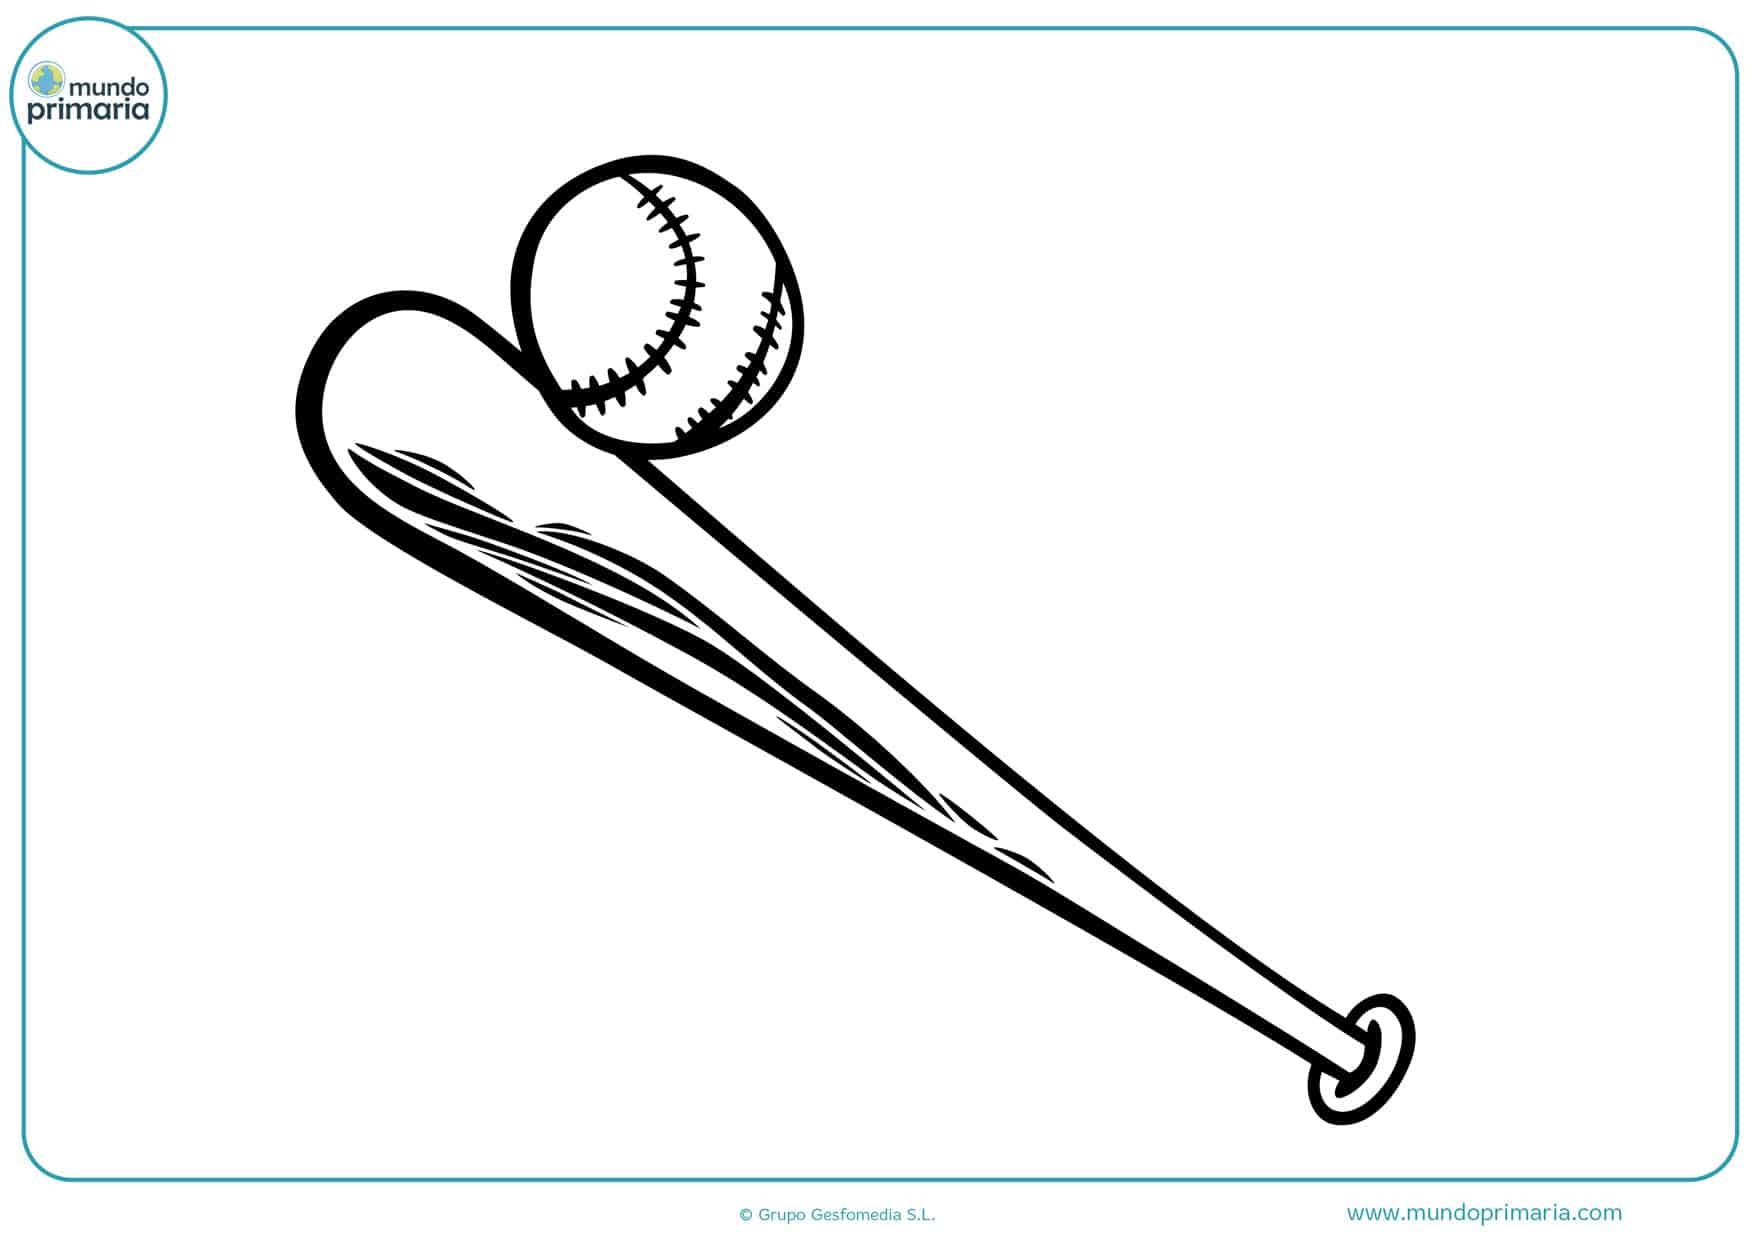 dibujos de bates de béisbol para colorear